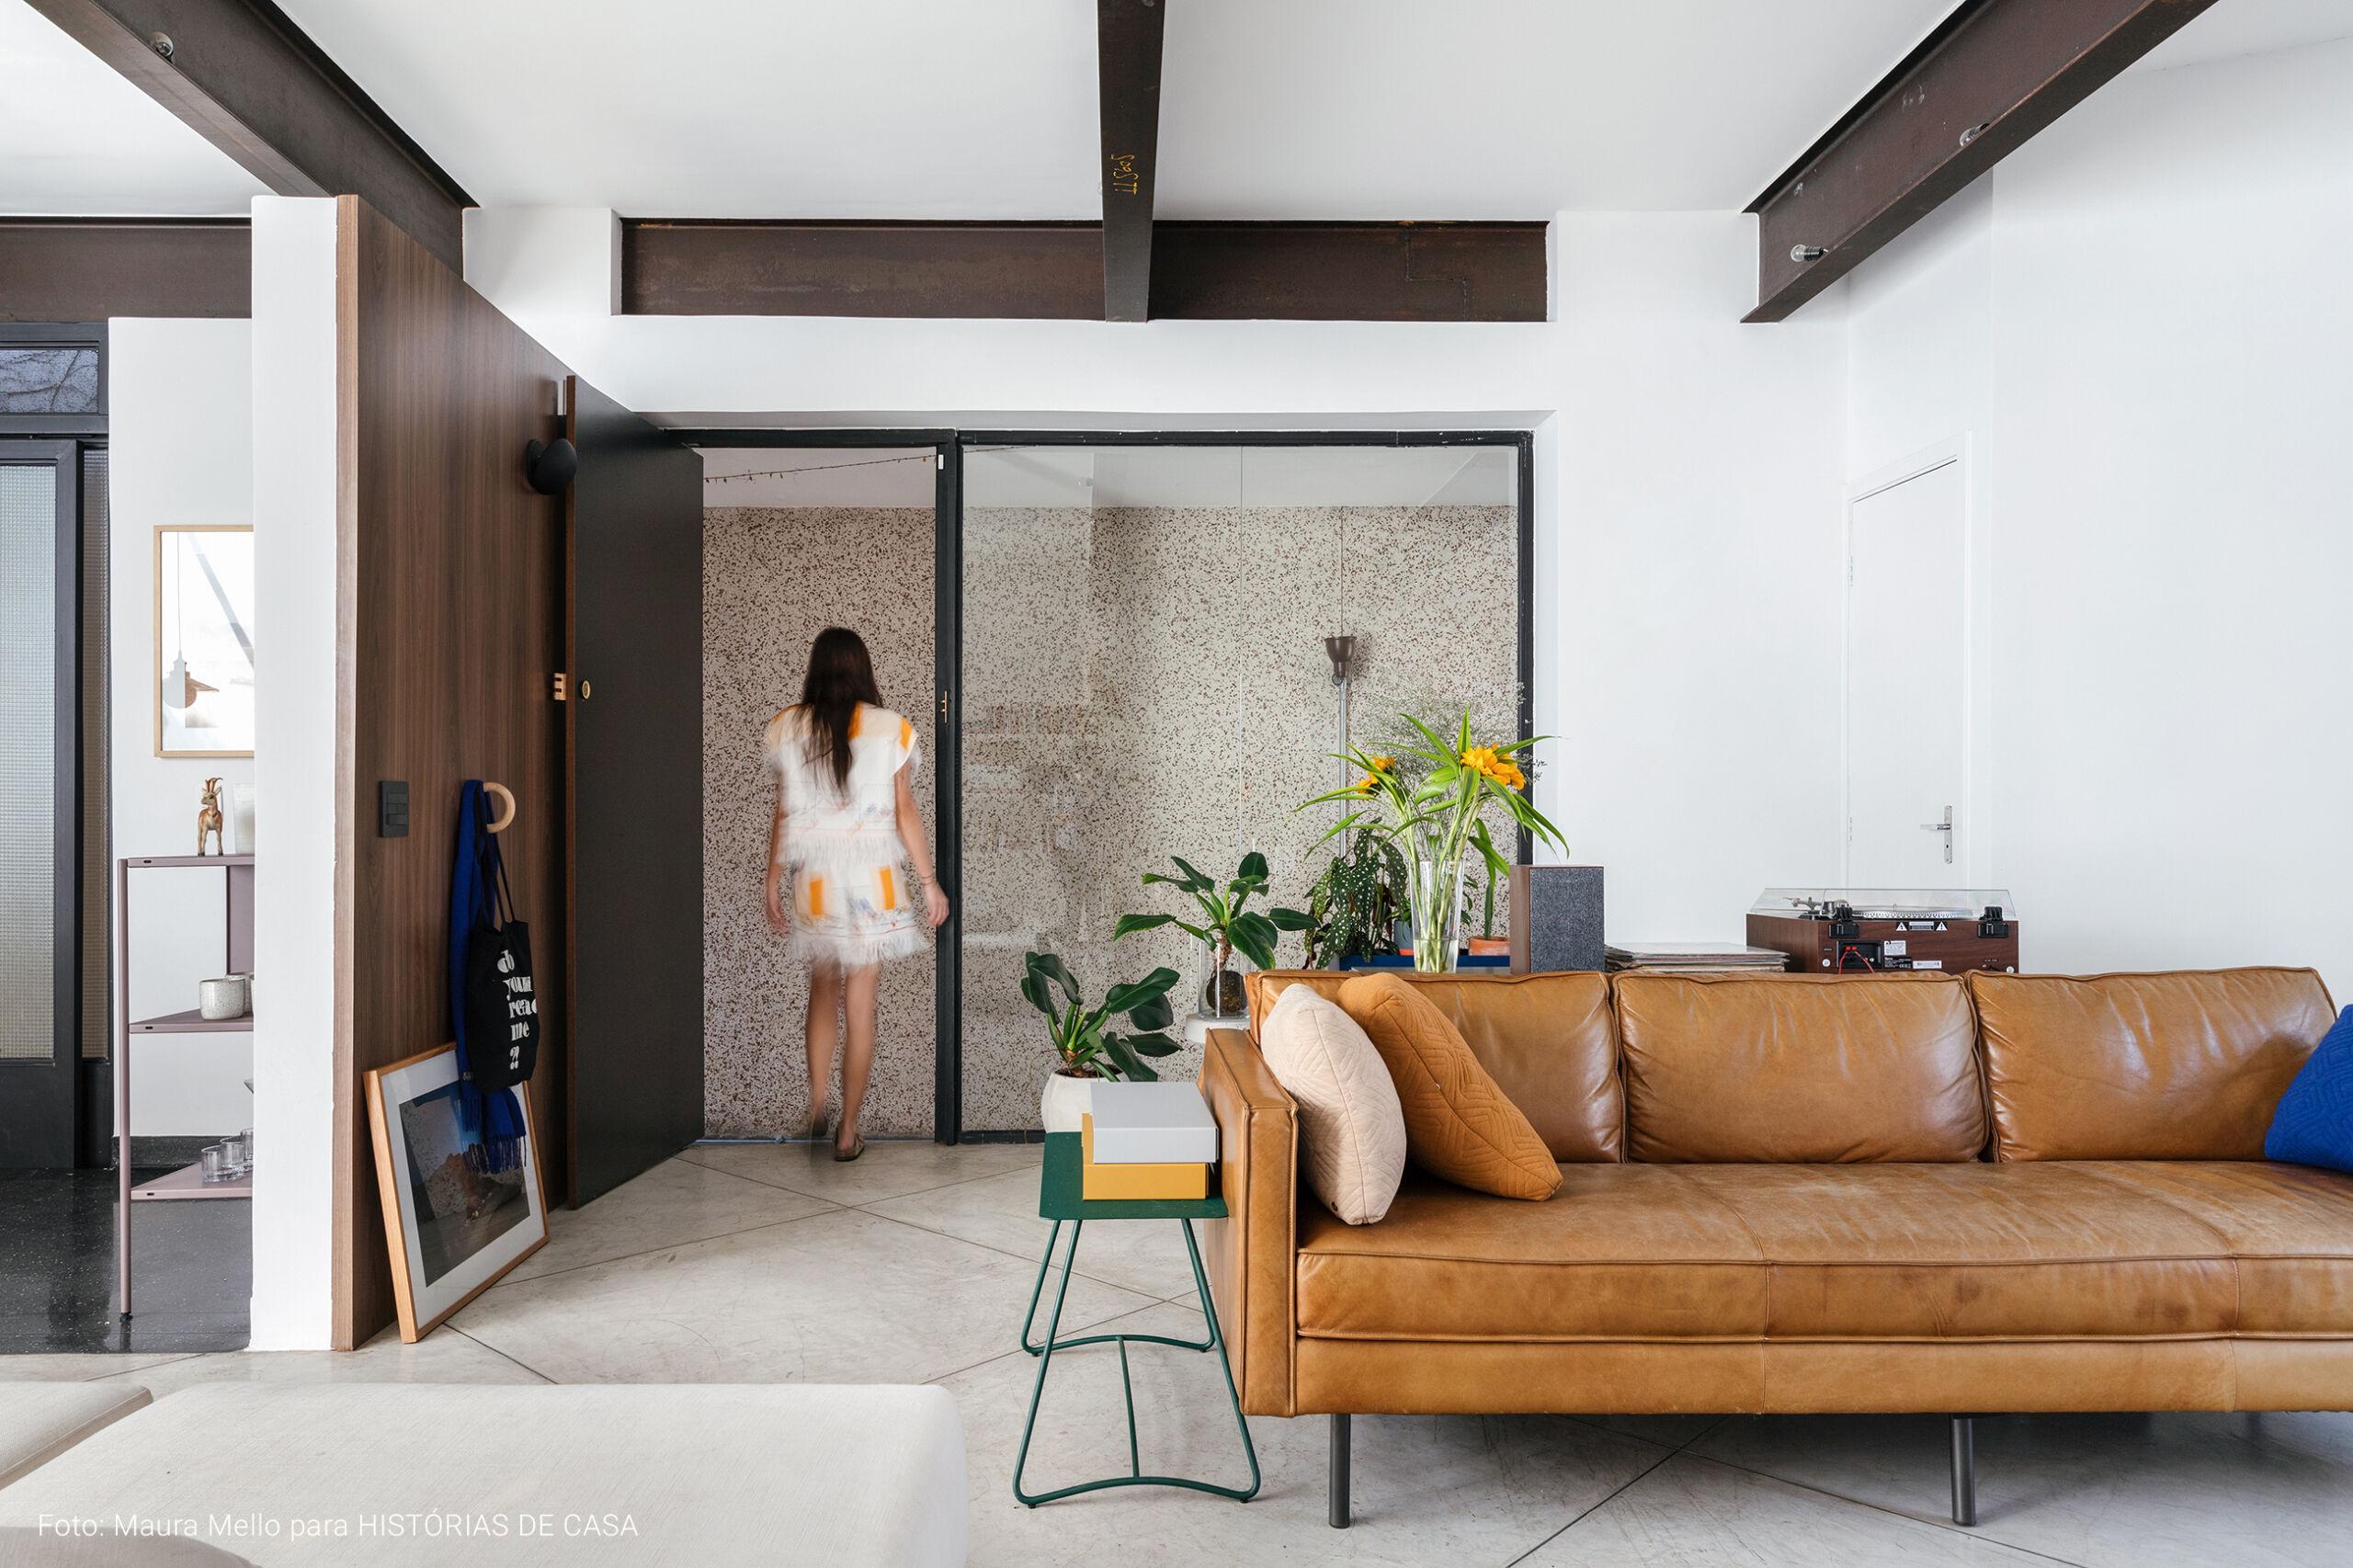 Casa com teto de vidro, piso branco e muita arte